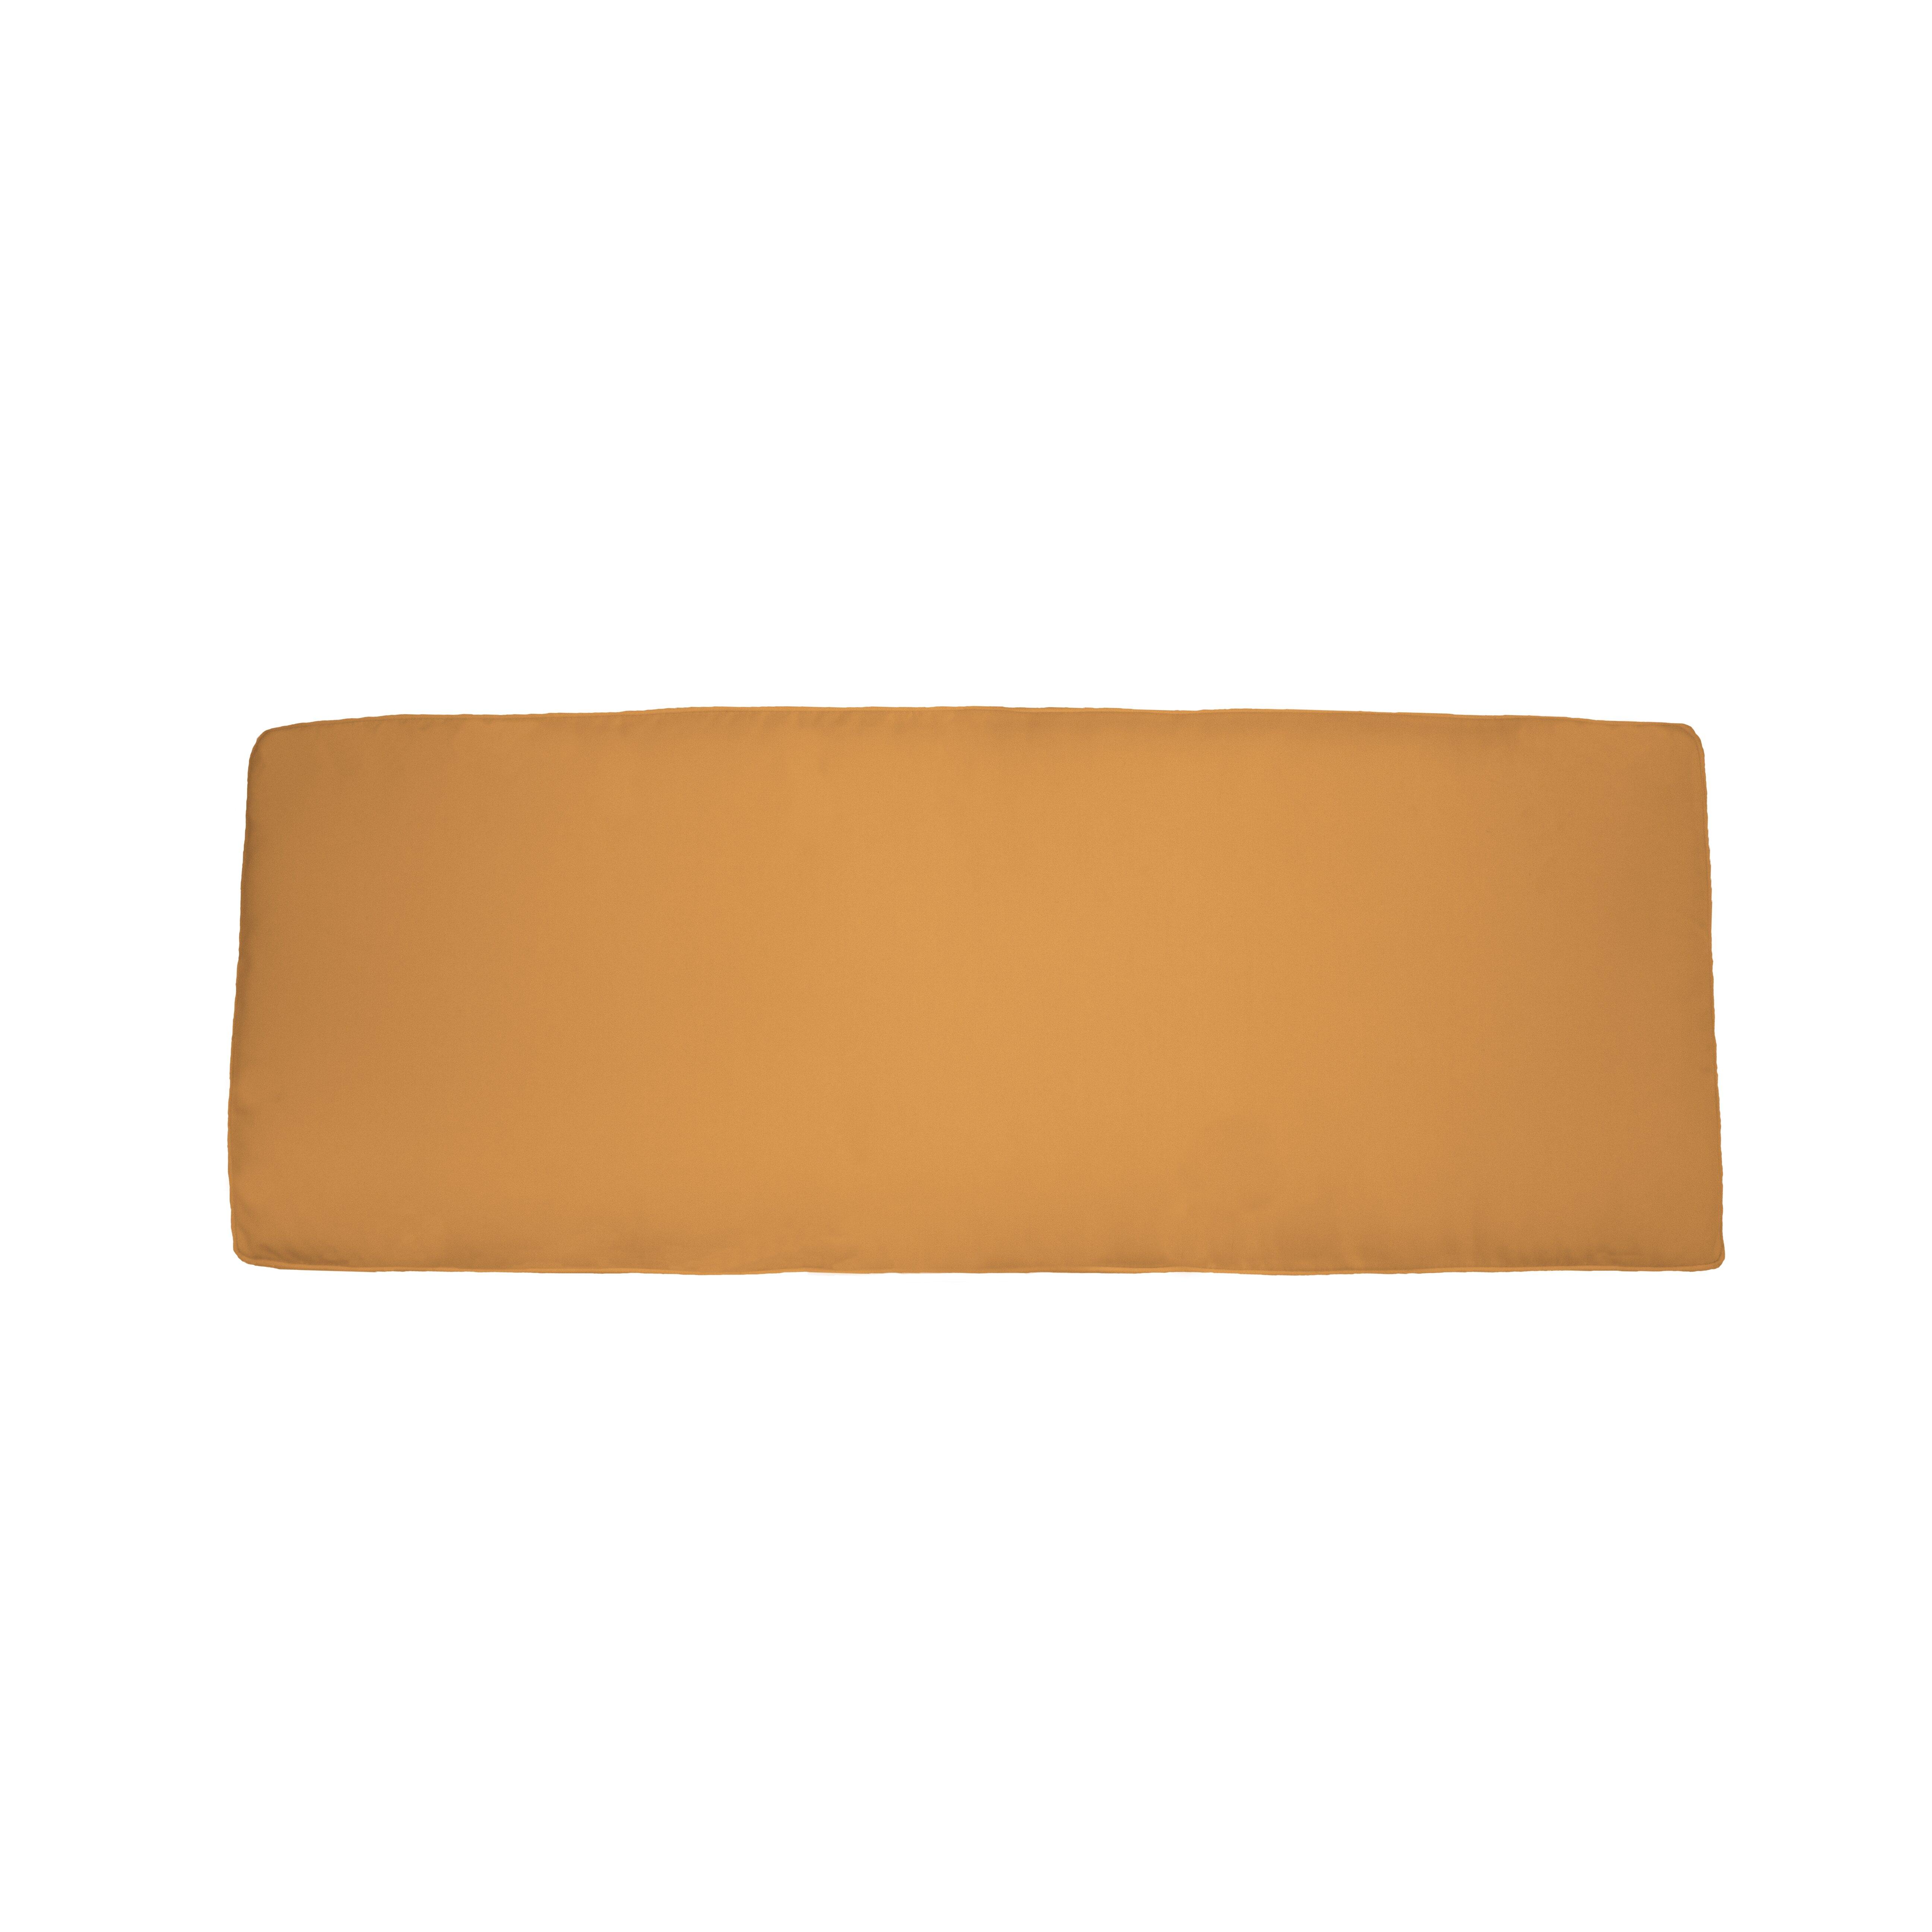 Wayfair Custom Outdoor Cushions Double Piped Outdoor Sunbrella Bench Cushion Reviews Wayfair